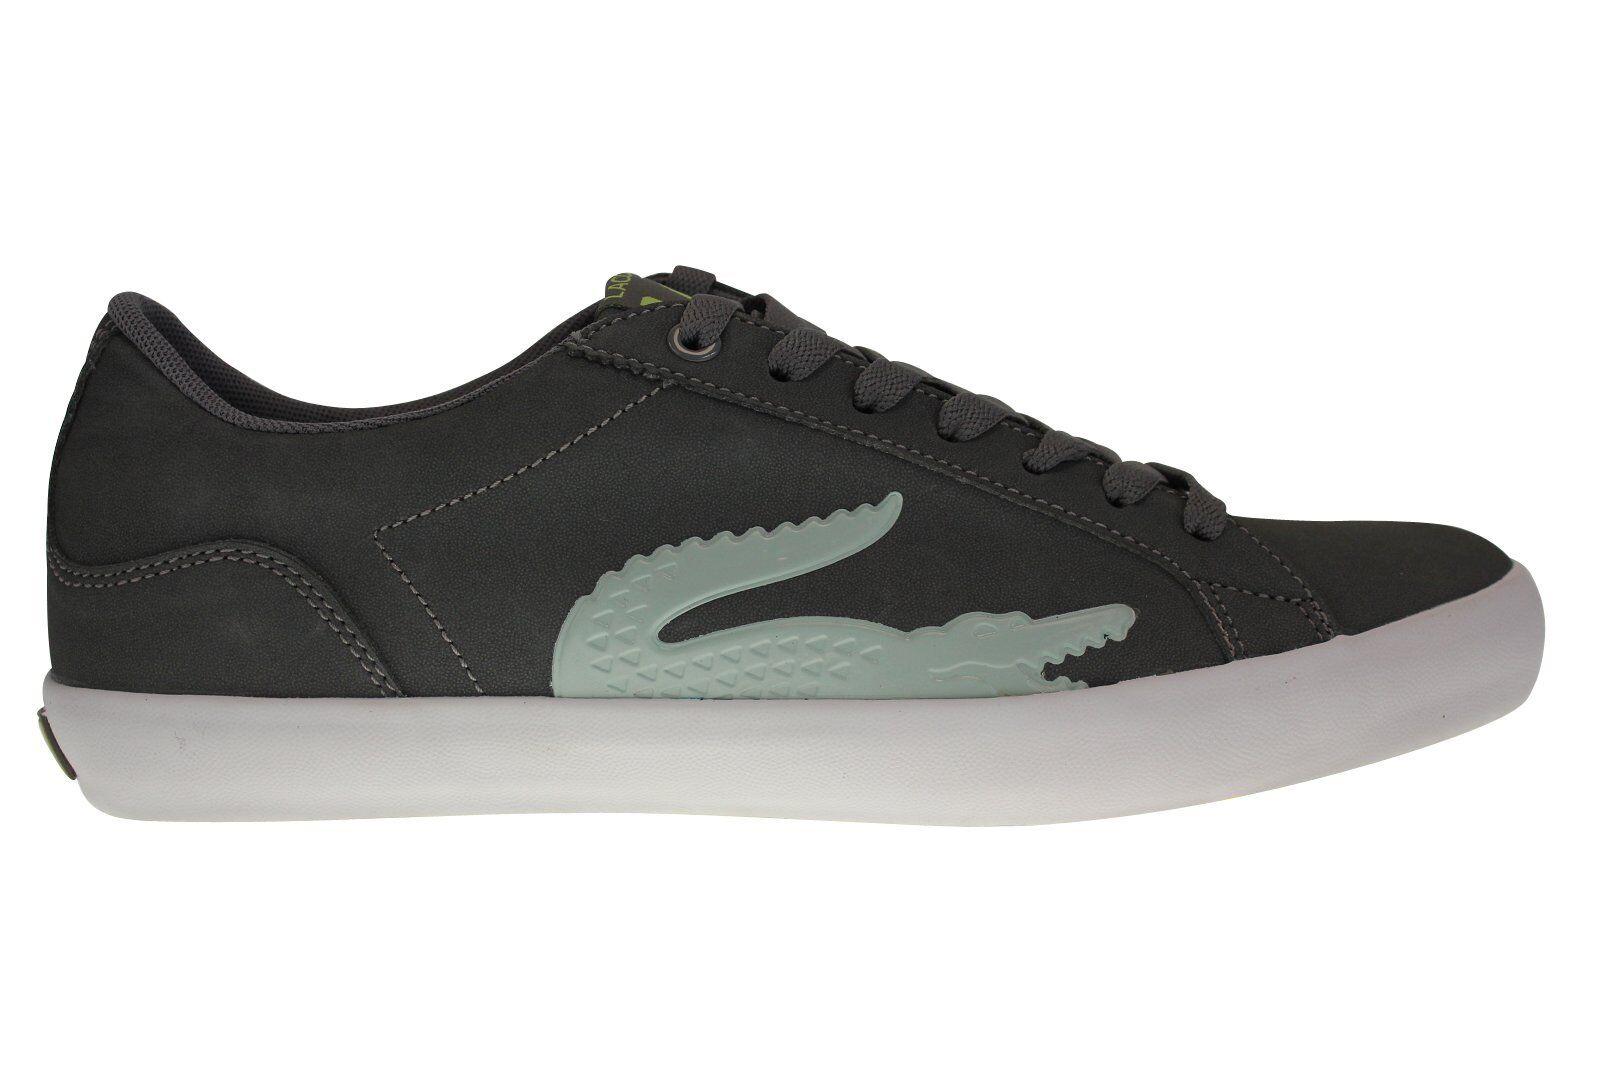 Lacoste Schuh Lerond SC NEU Herren Schuh Lacoste Grau Freizeit Sneaker Golf Polo 33894e